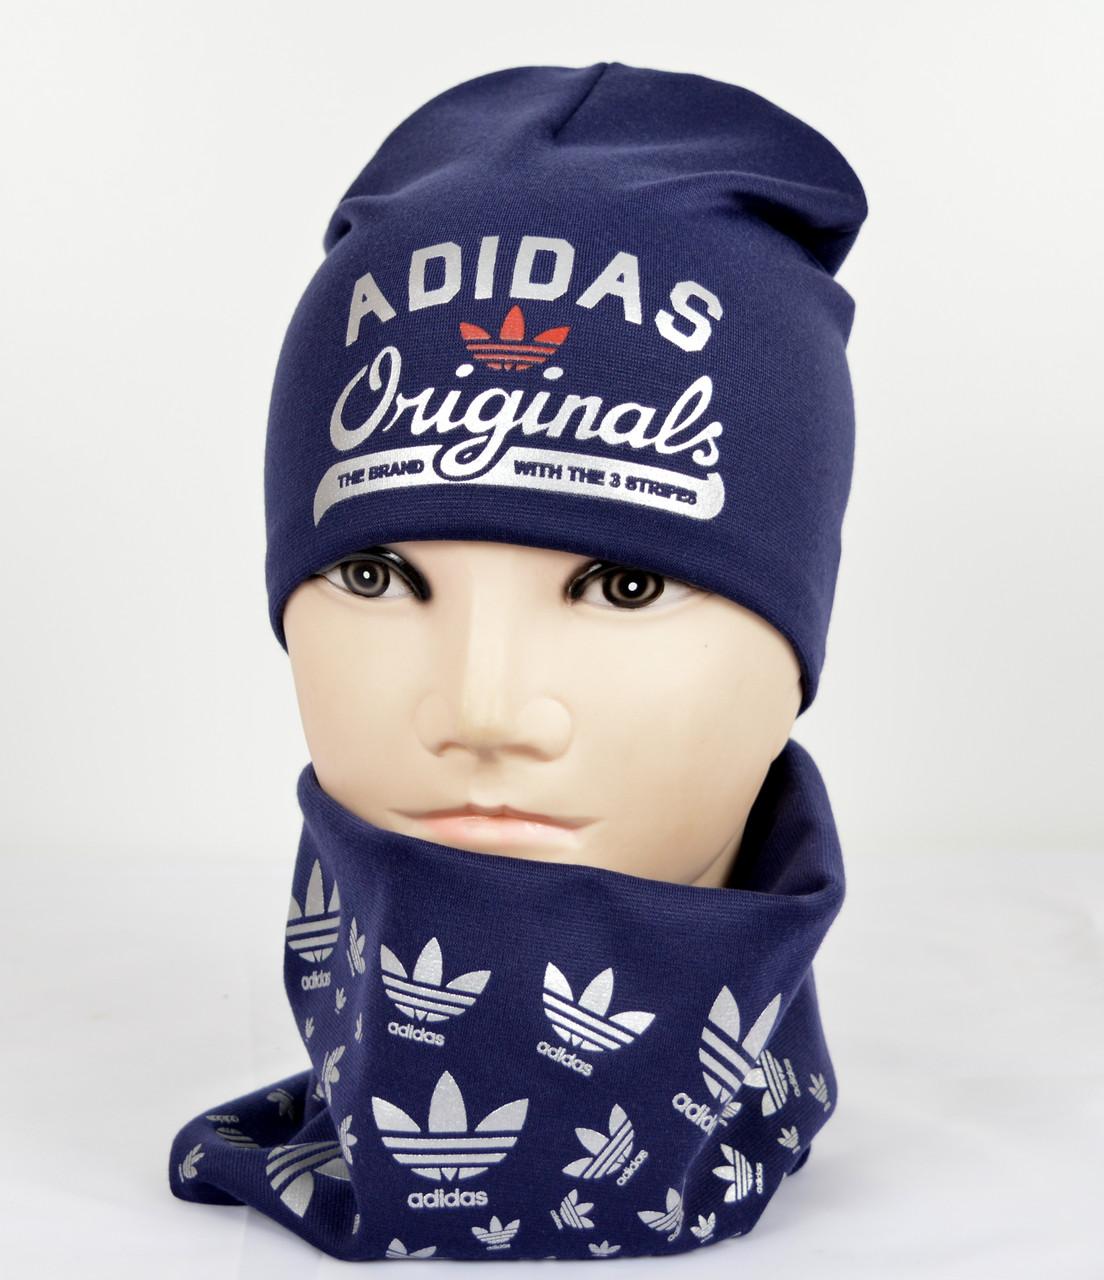 Трикотажный комплект Adidas (шапка+хомут) синий+серебро